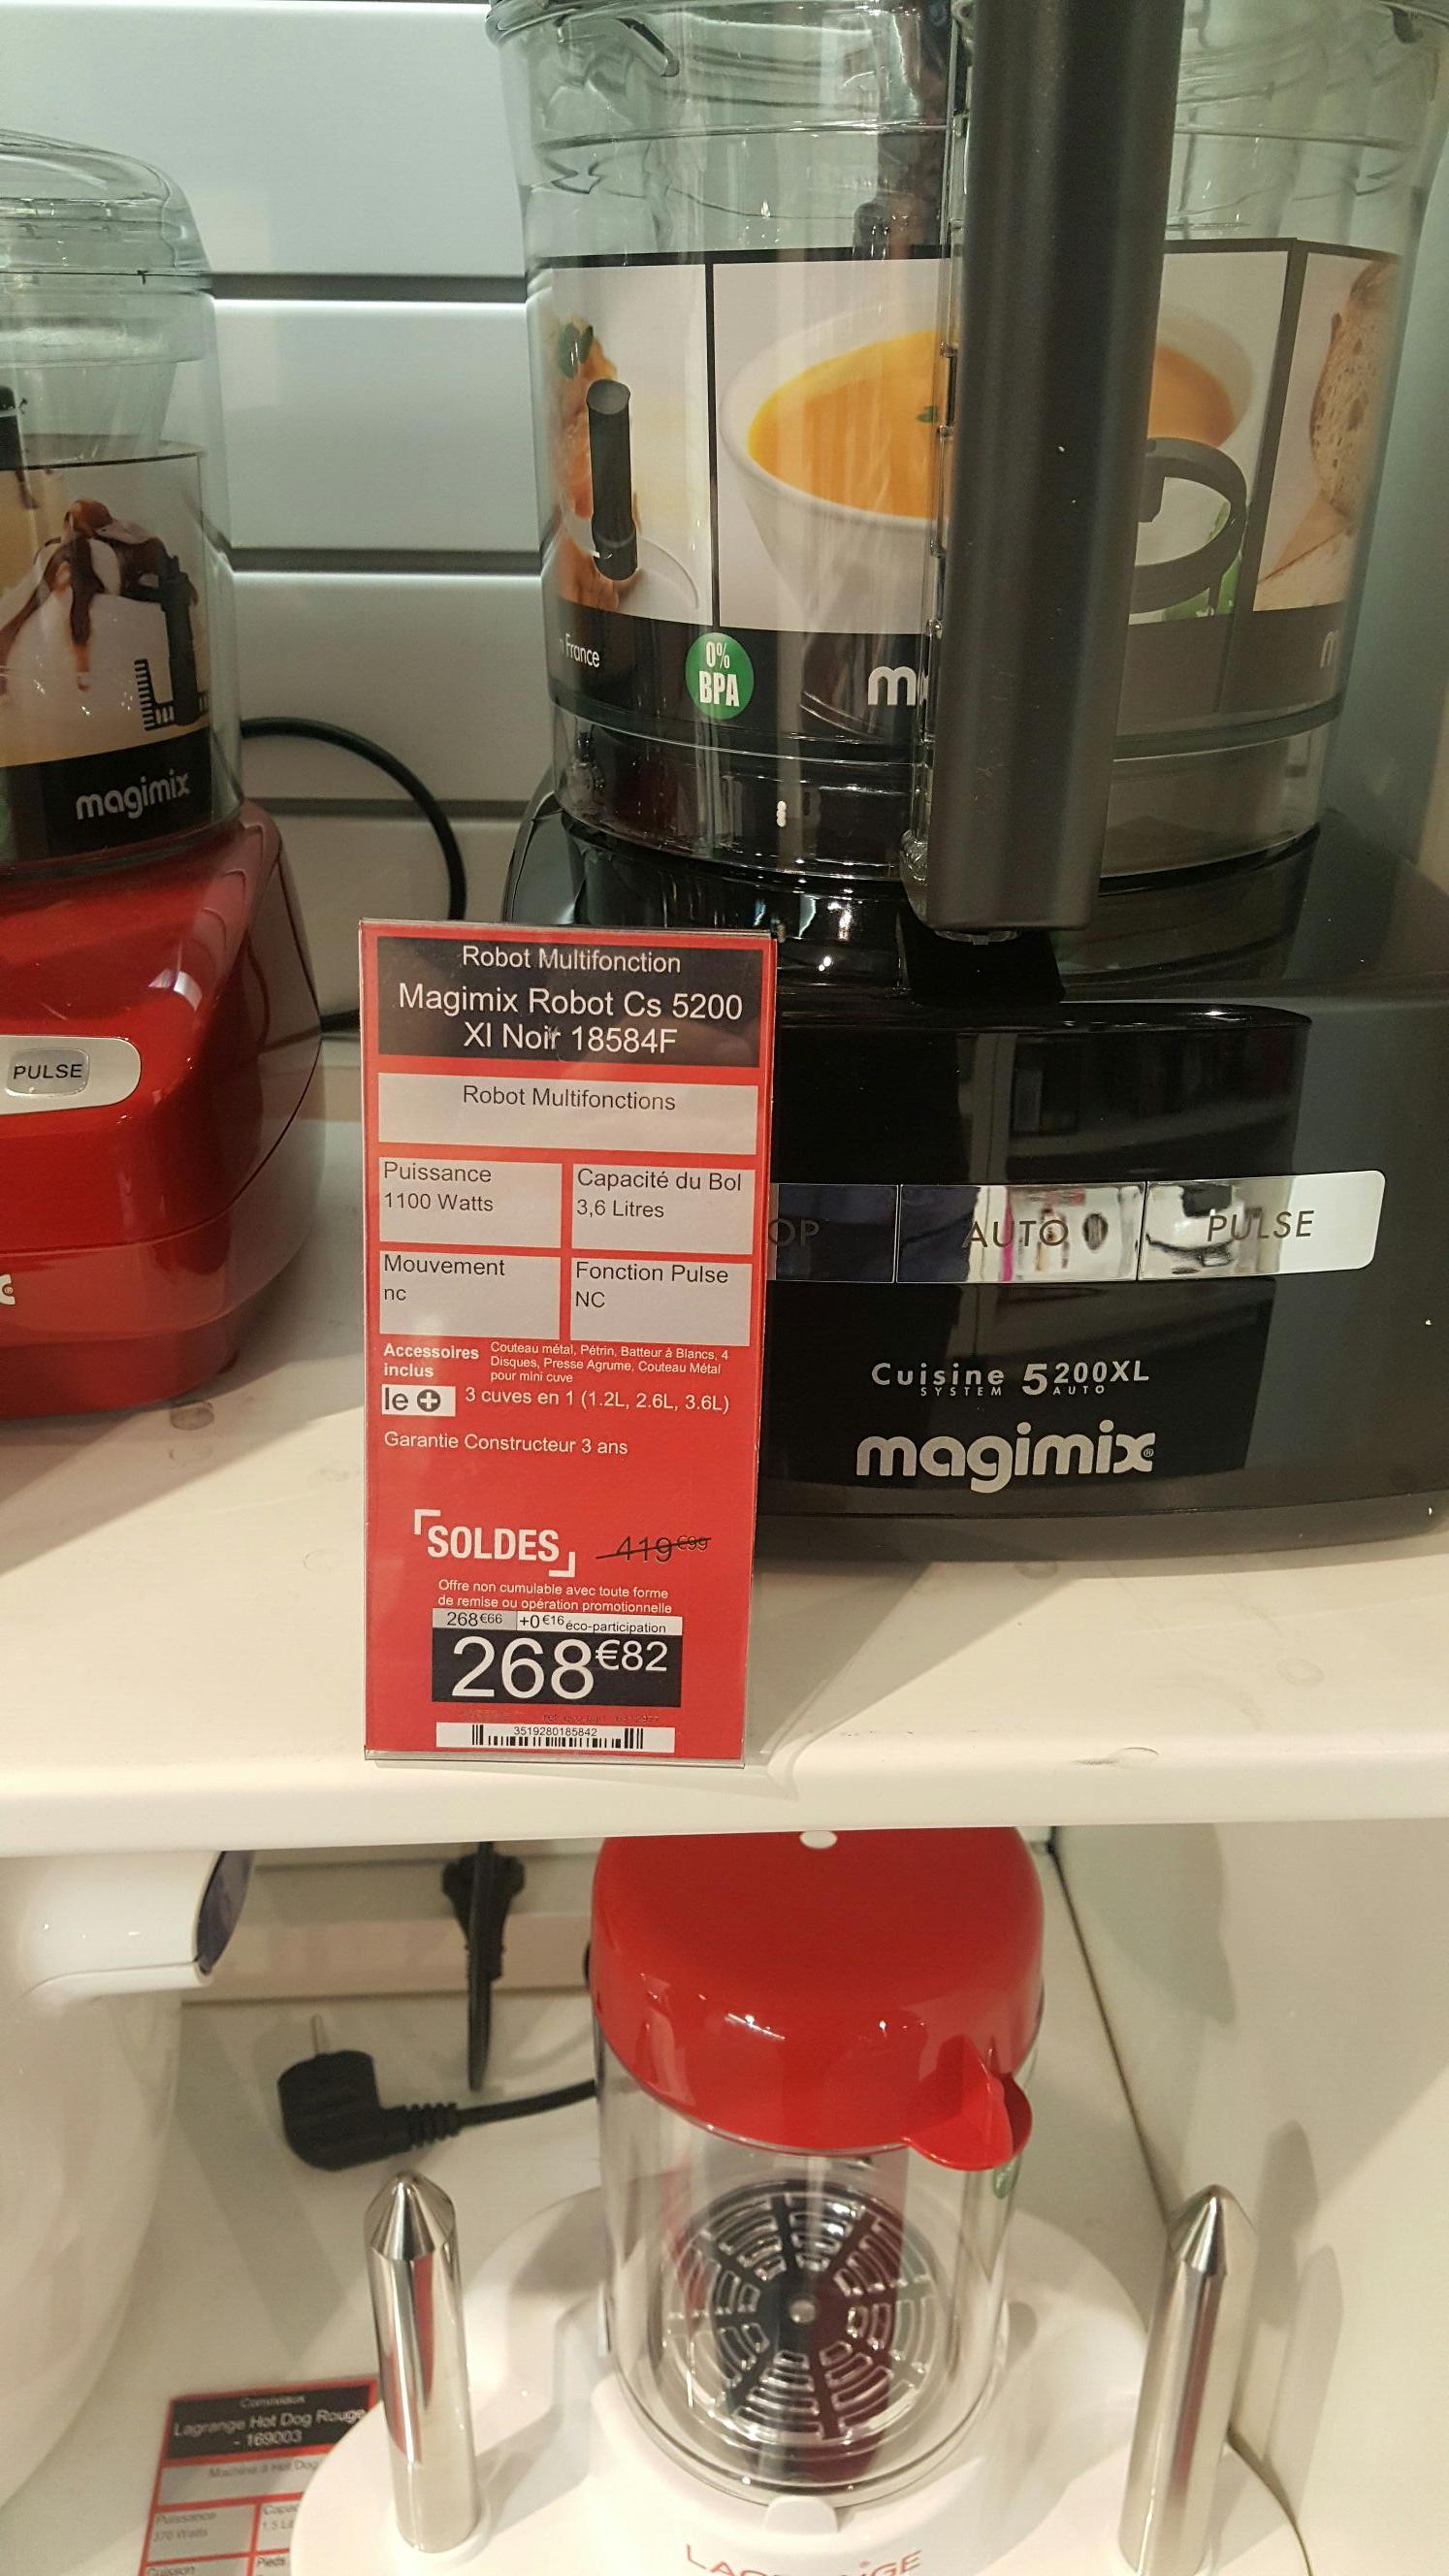 Robot multifonction Magimix cs5200 XL - Noir